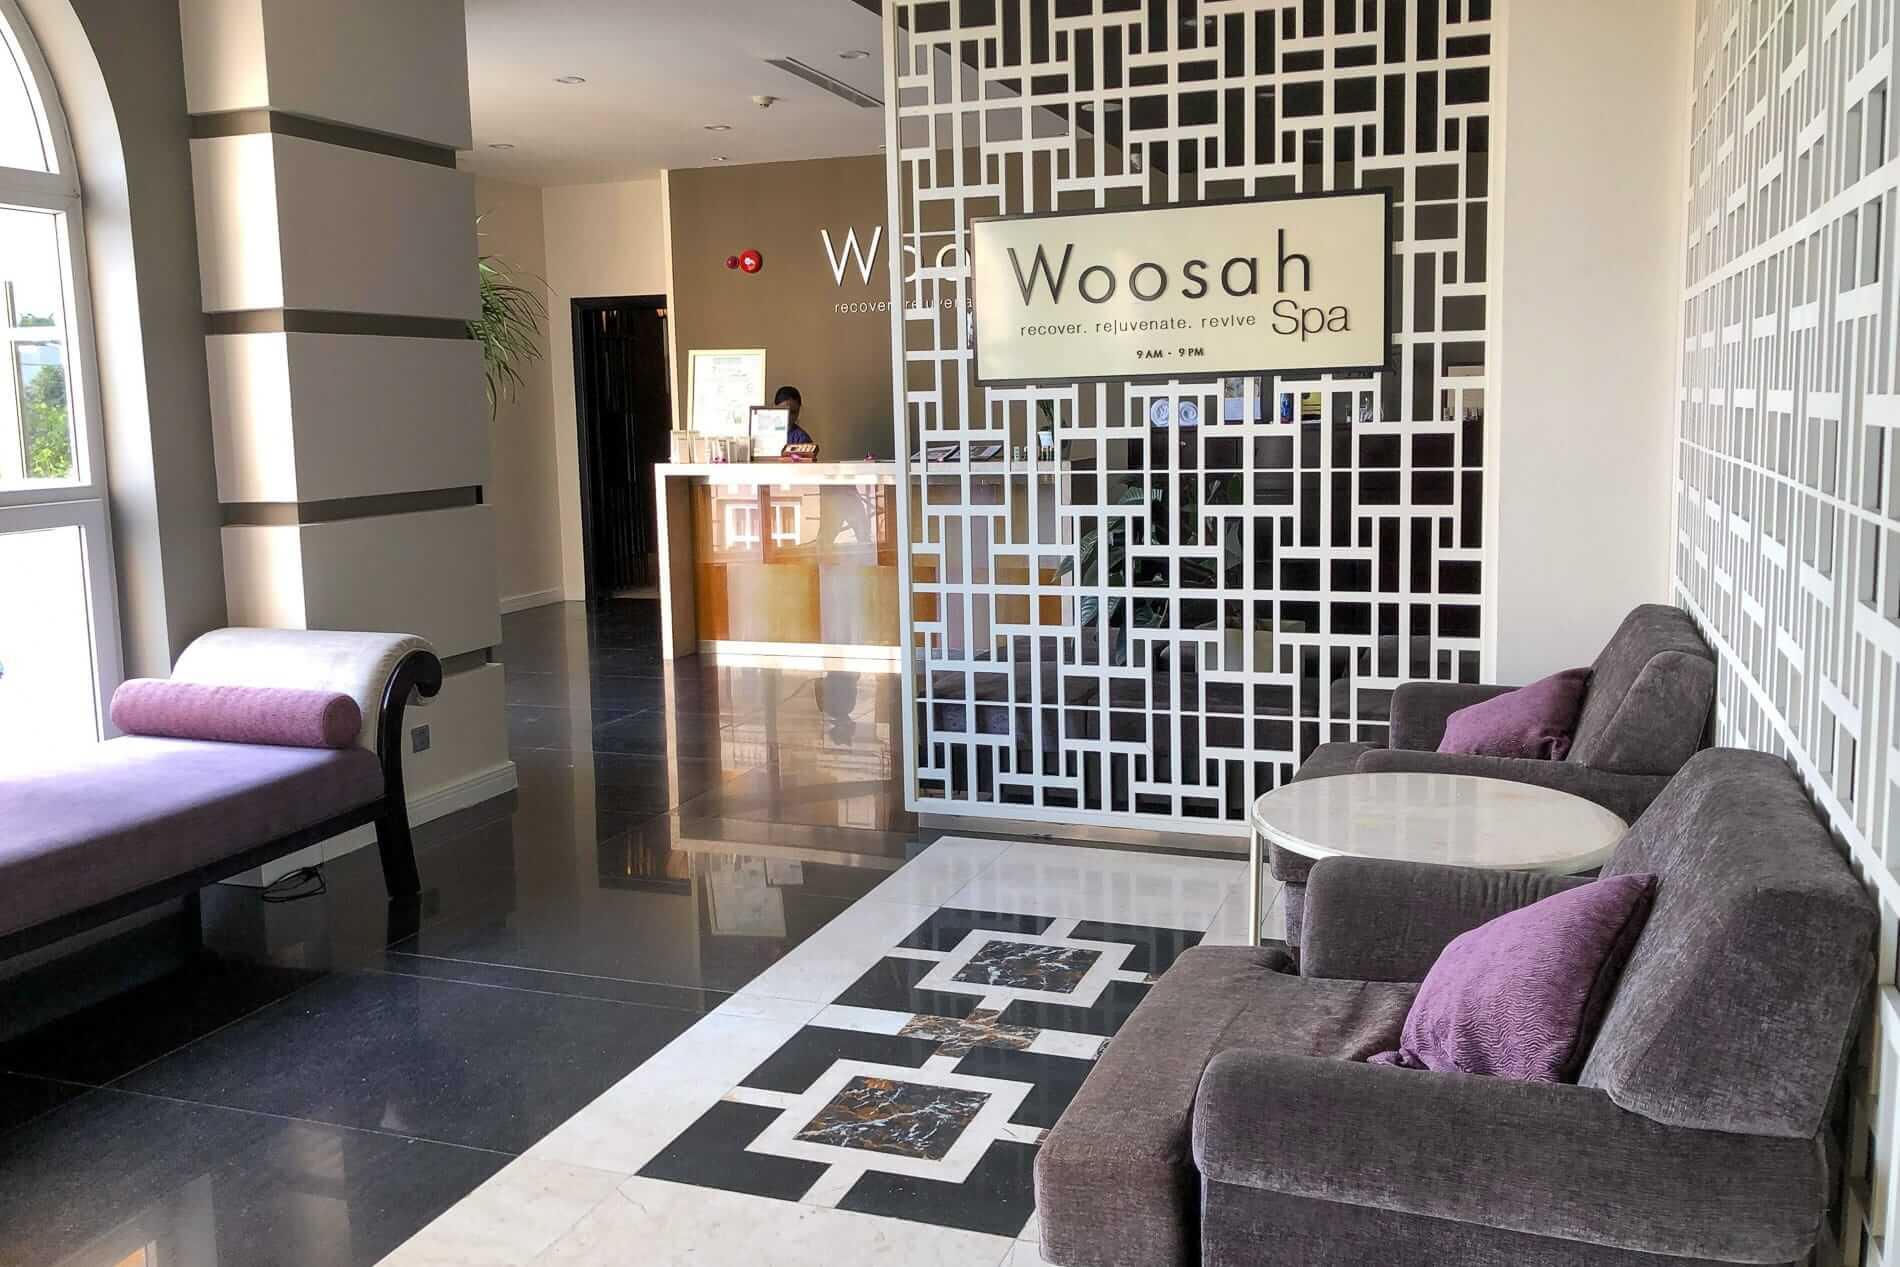 cozy reception hall at Woosah Spa in Hoi An